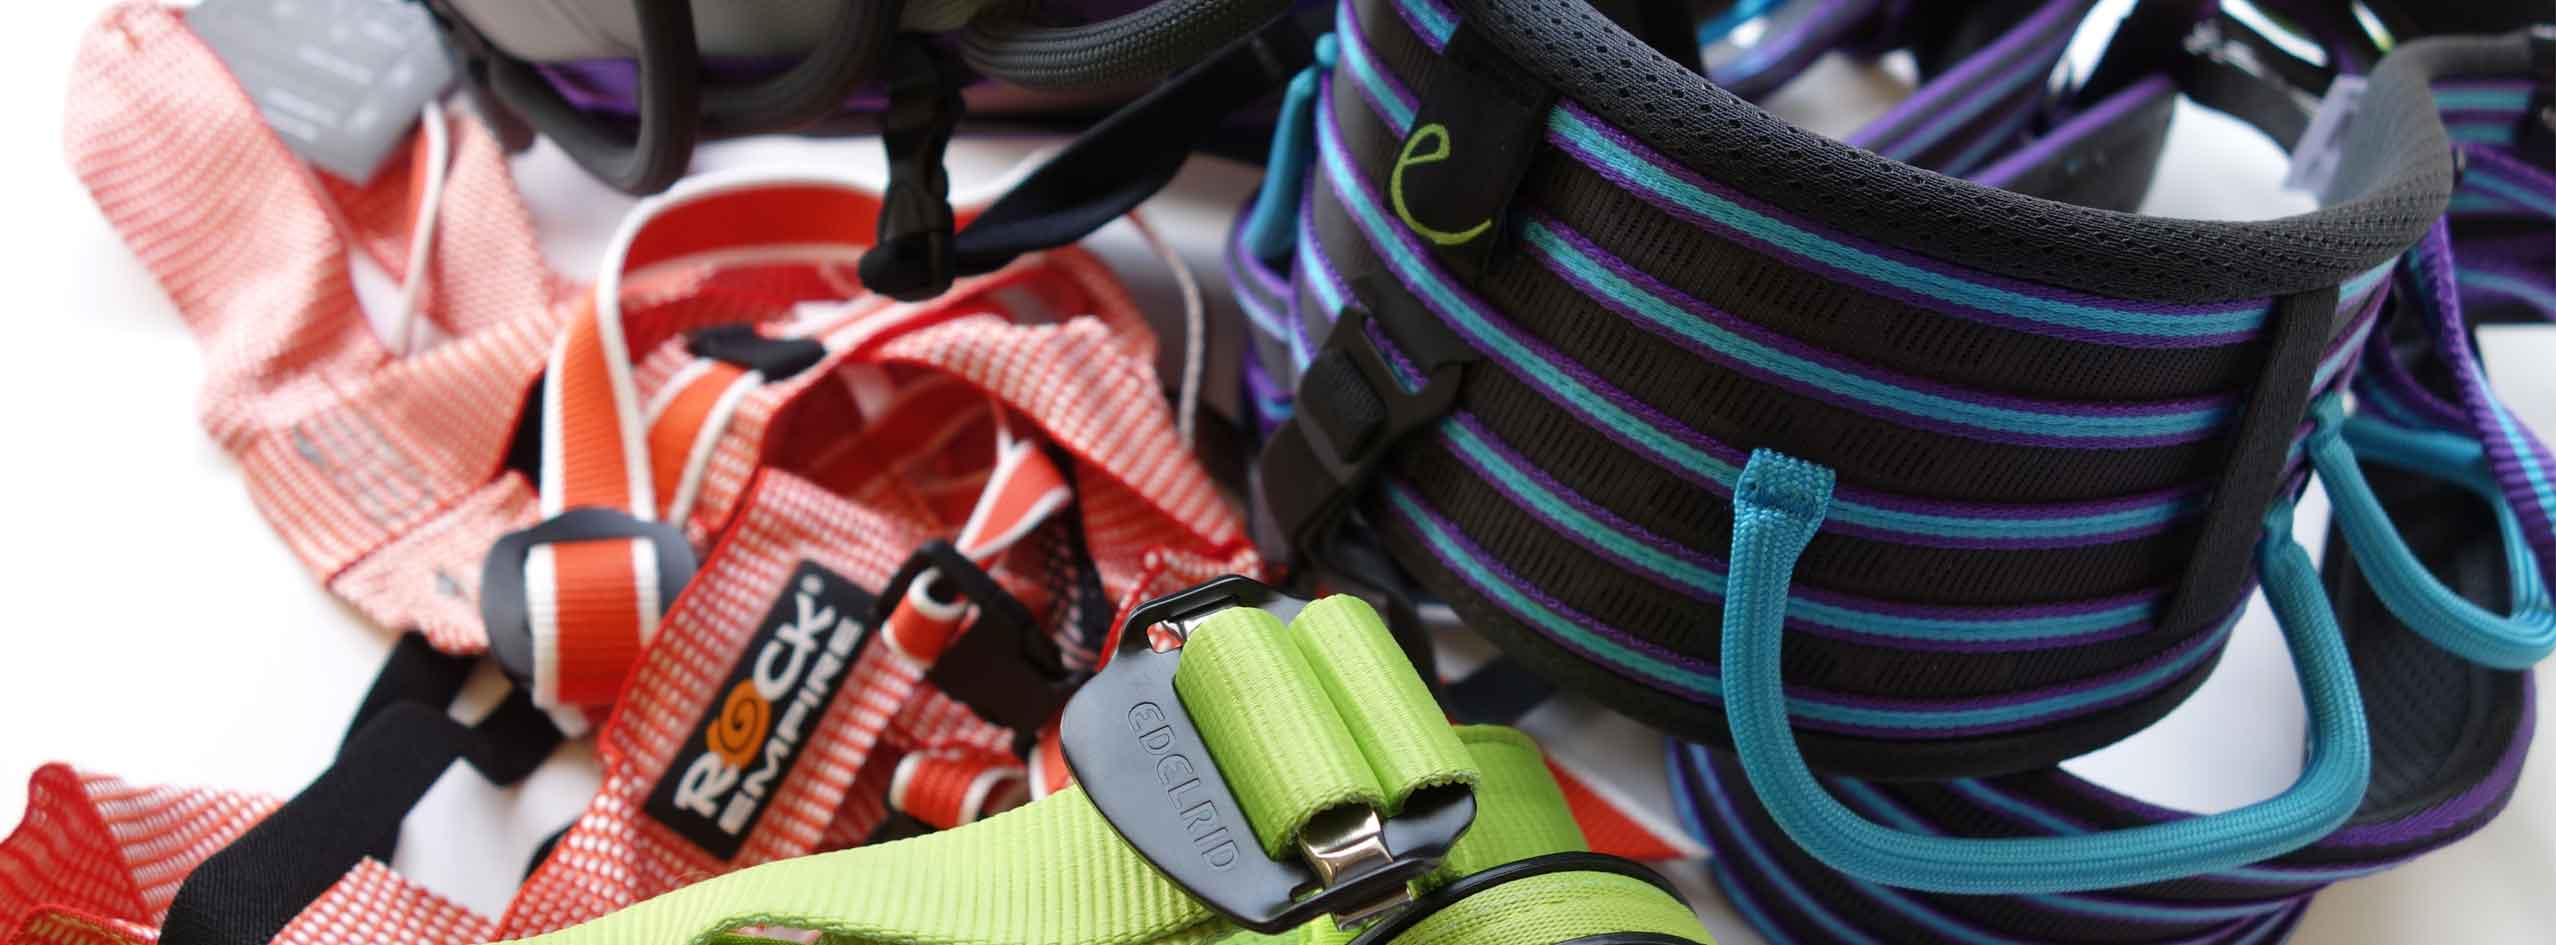 Rock climbing harnesses